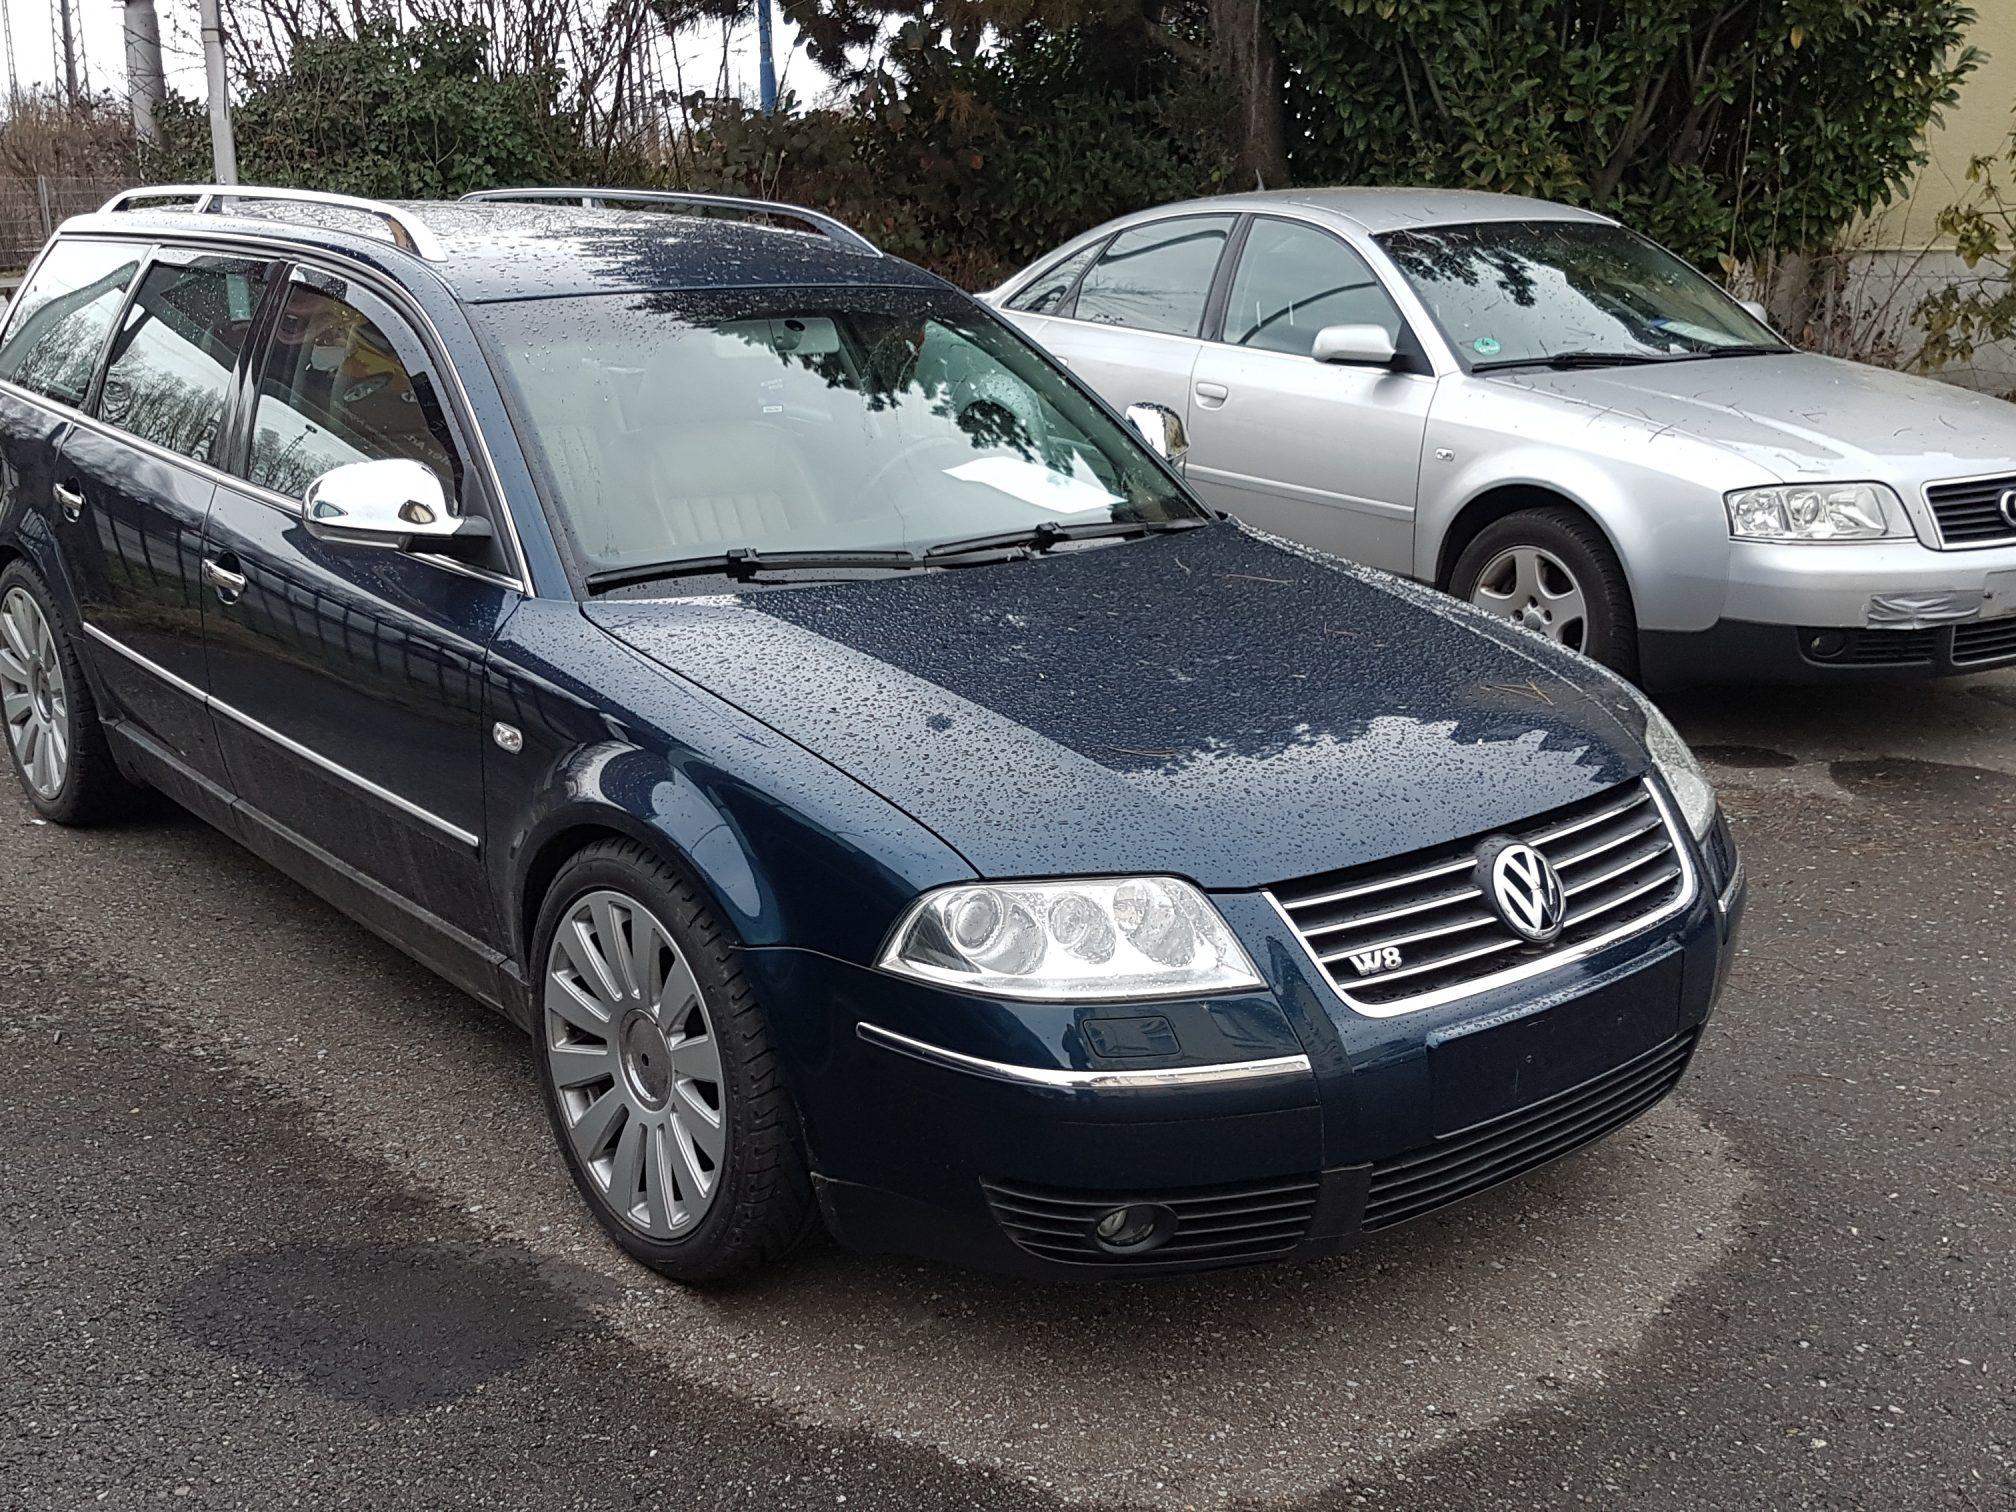 VW4.0 W8